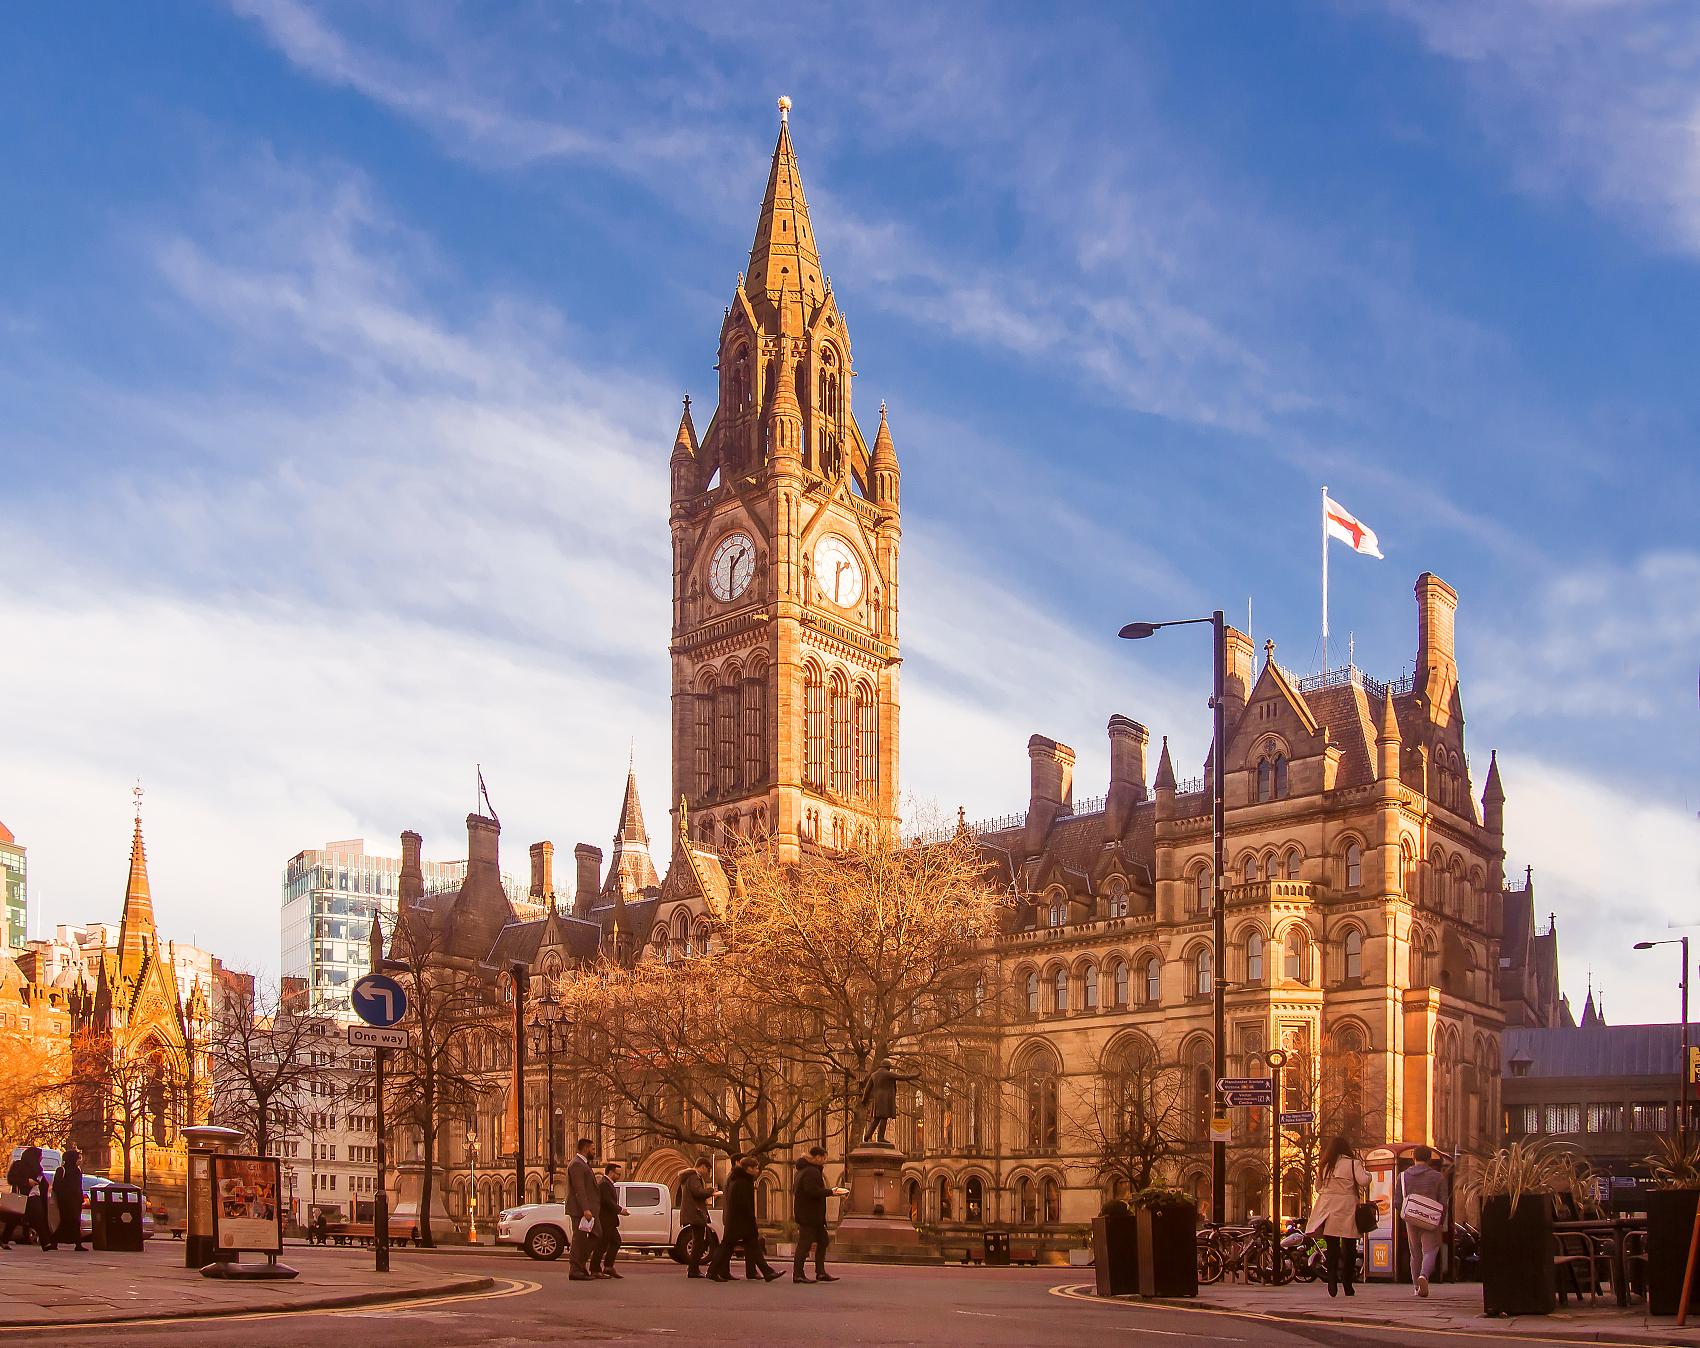 UNESCO names Manchester as a City of Literature